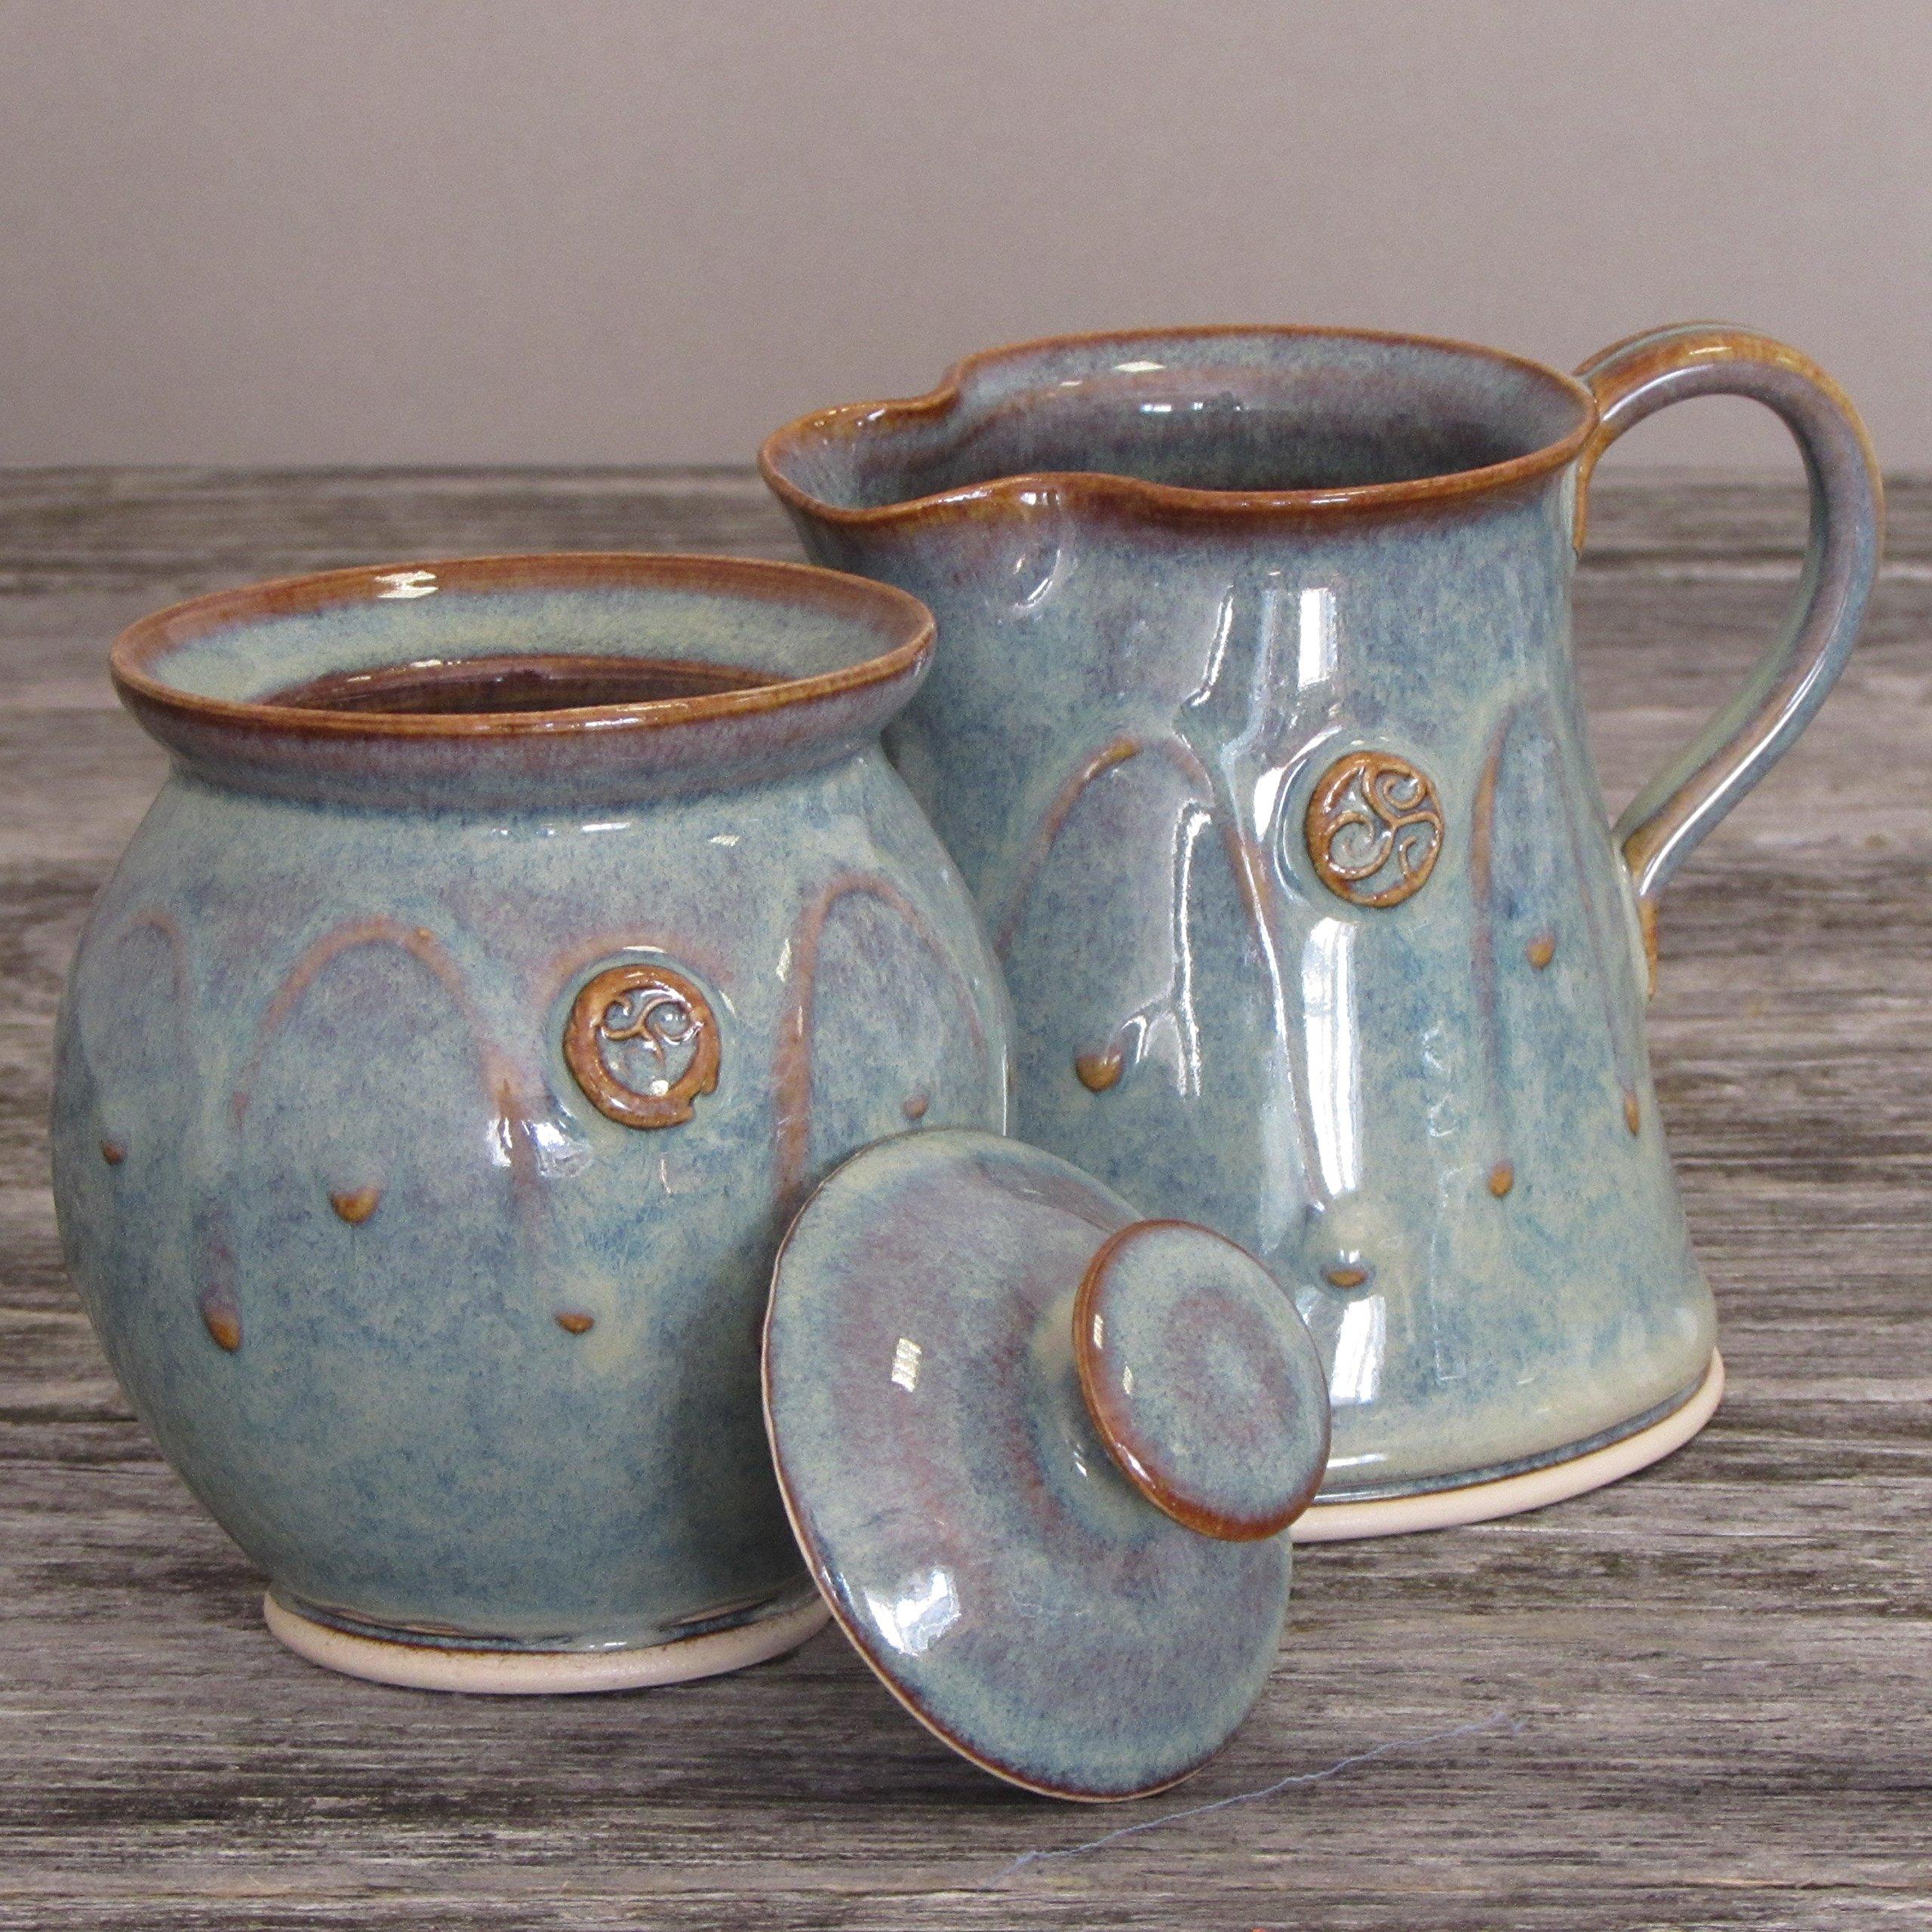 Handmade Irish Pottery Sugar and Creamer Set by Castle Arch Pottery Ireland (Image #2)